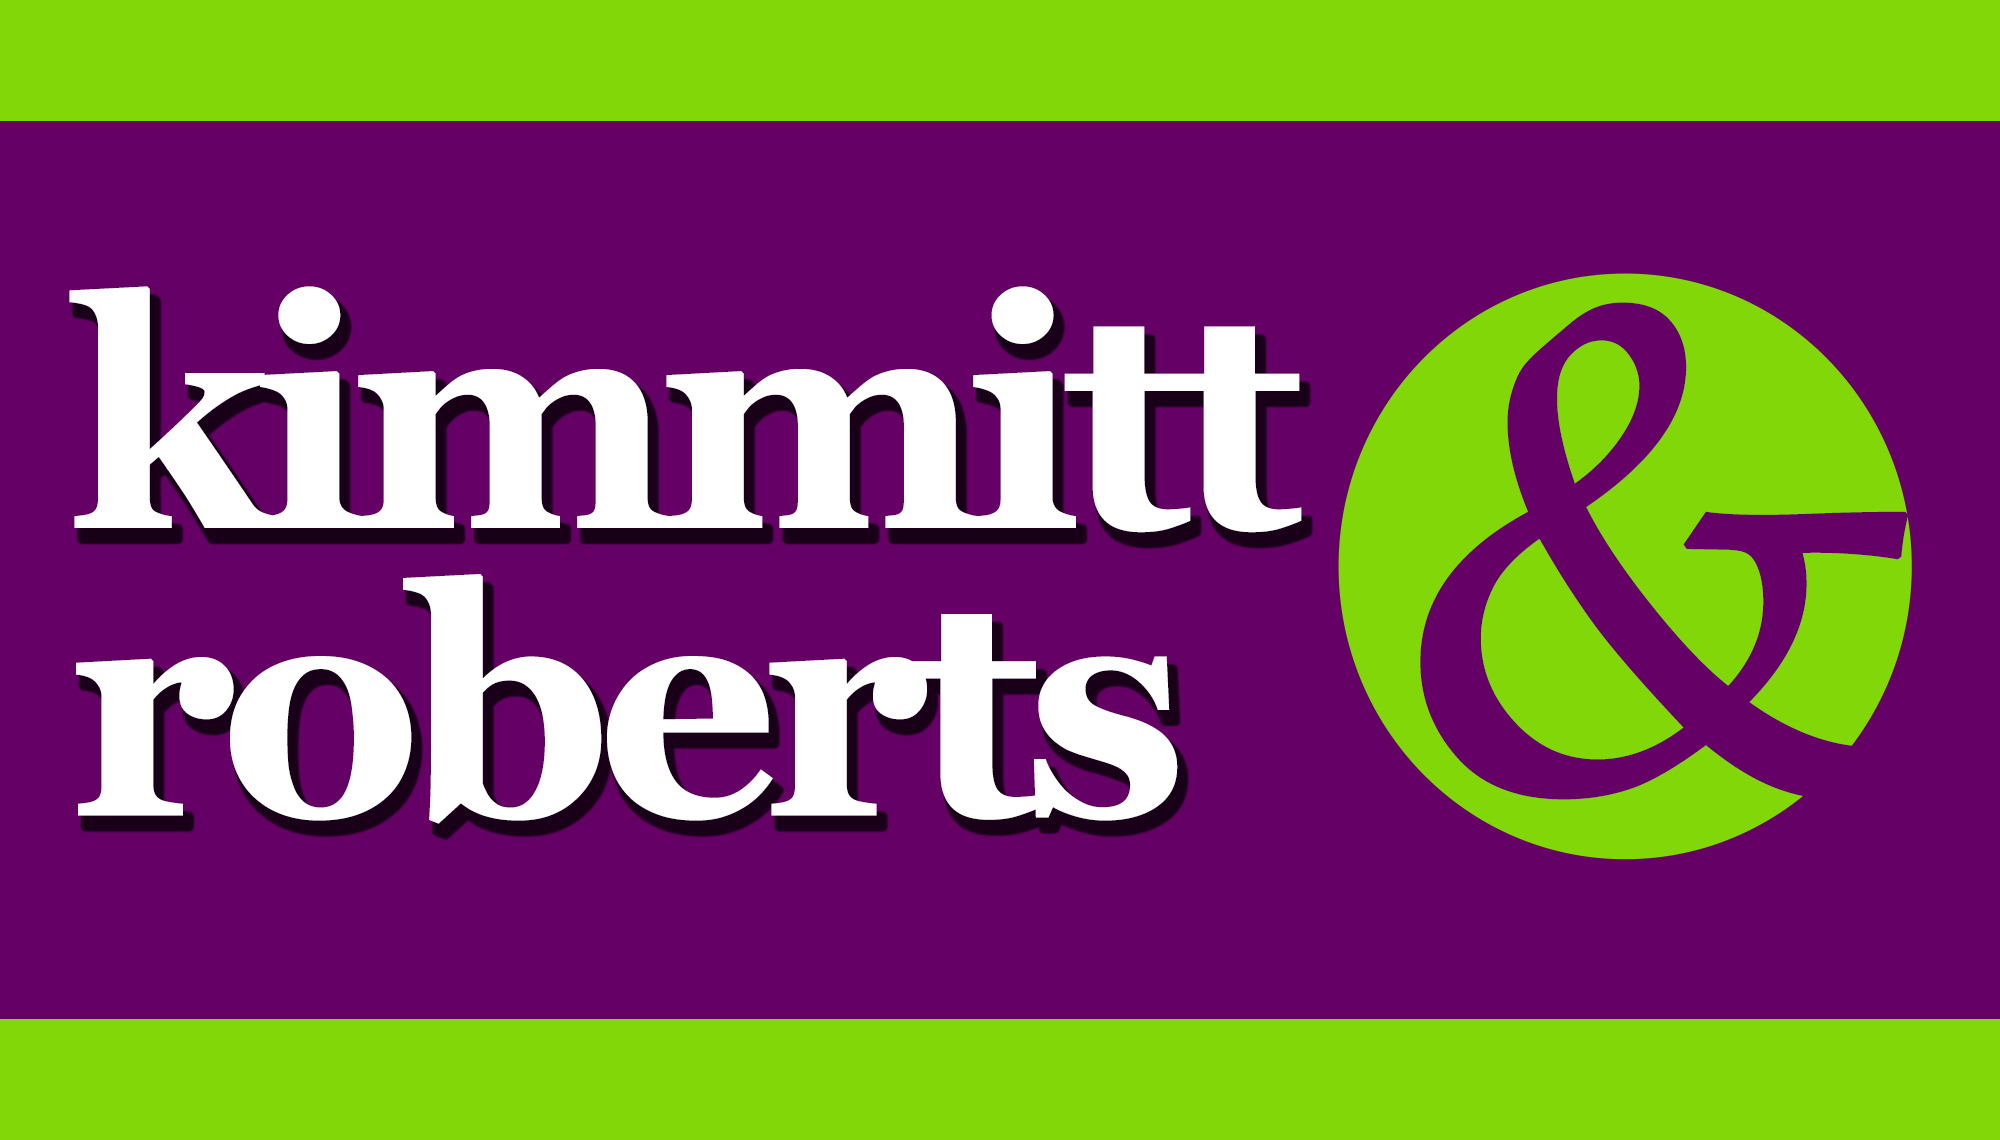 Kimmitt & Roberts